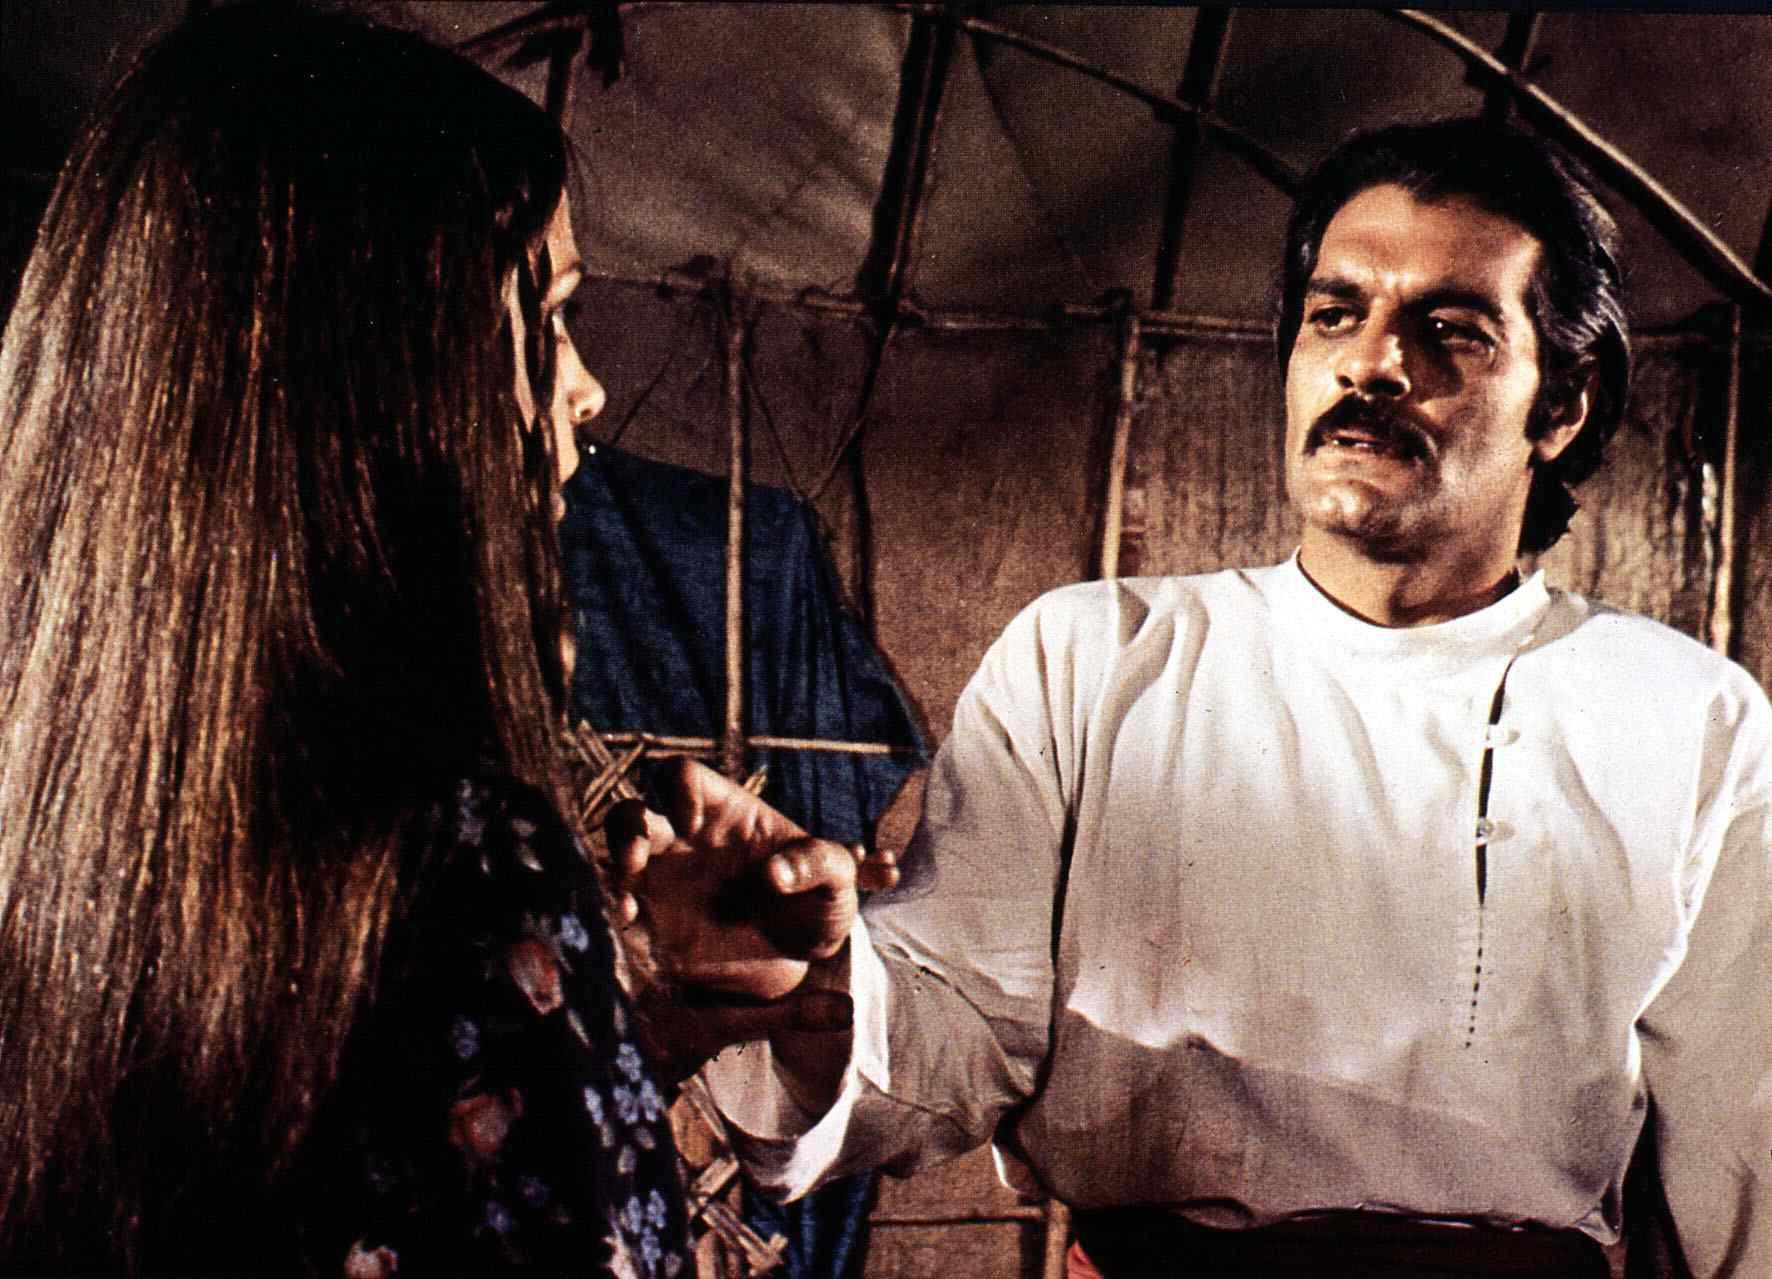 Horsemen, The  (1971) Leigh Taylor-Young, Omar Sharif   Als Uraz (Omar Sharif) schwer verletzt wird, begleitet ihn Zereh (Lei